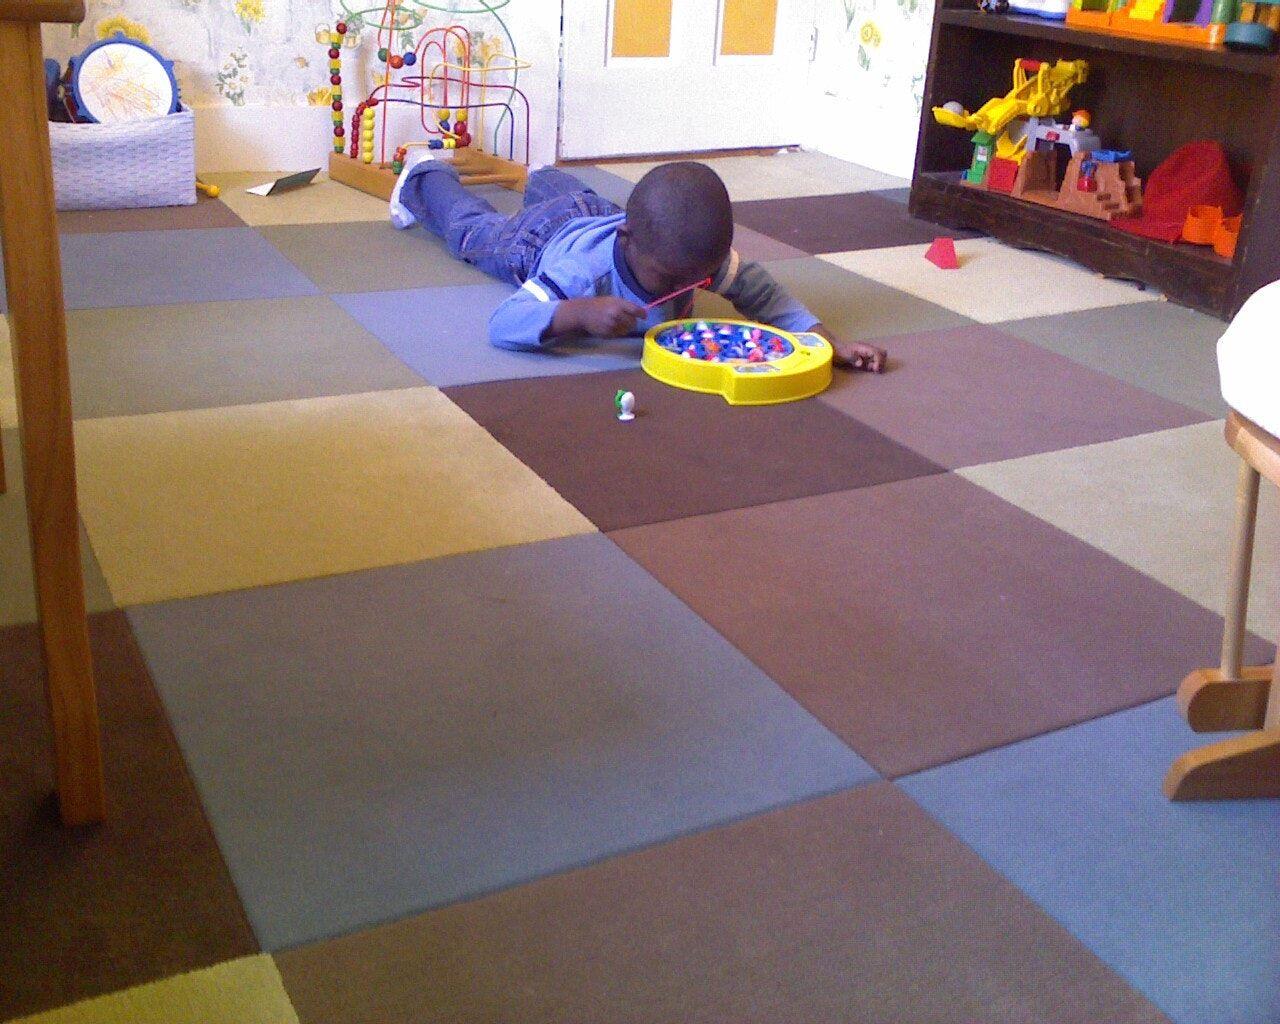 2019 rubber flooring for kids room interior design bedroom ideas rh pinterest com Rubber Flooring Basement Rubber Garage Flooring